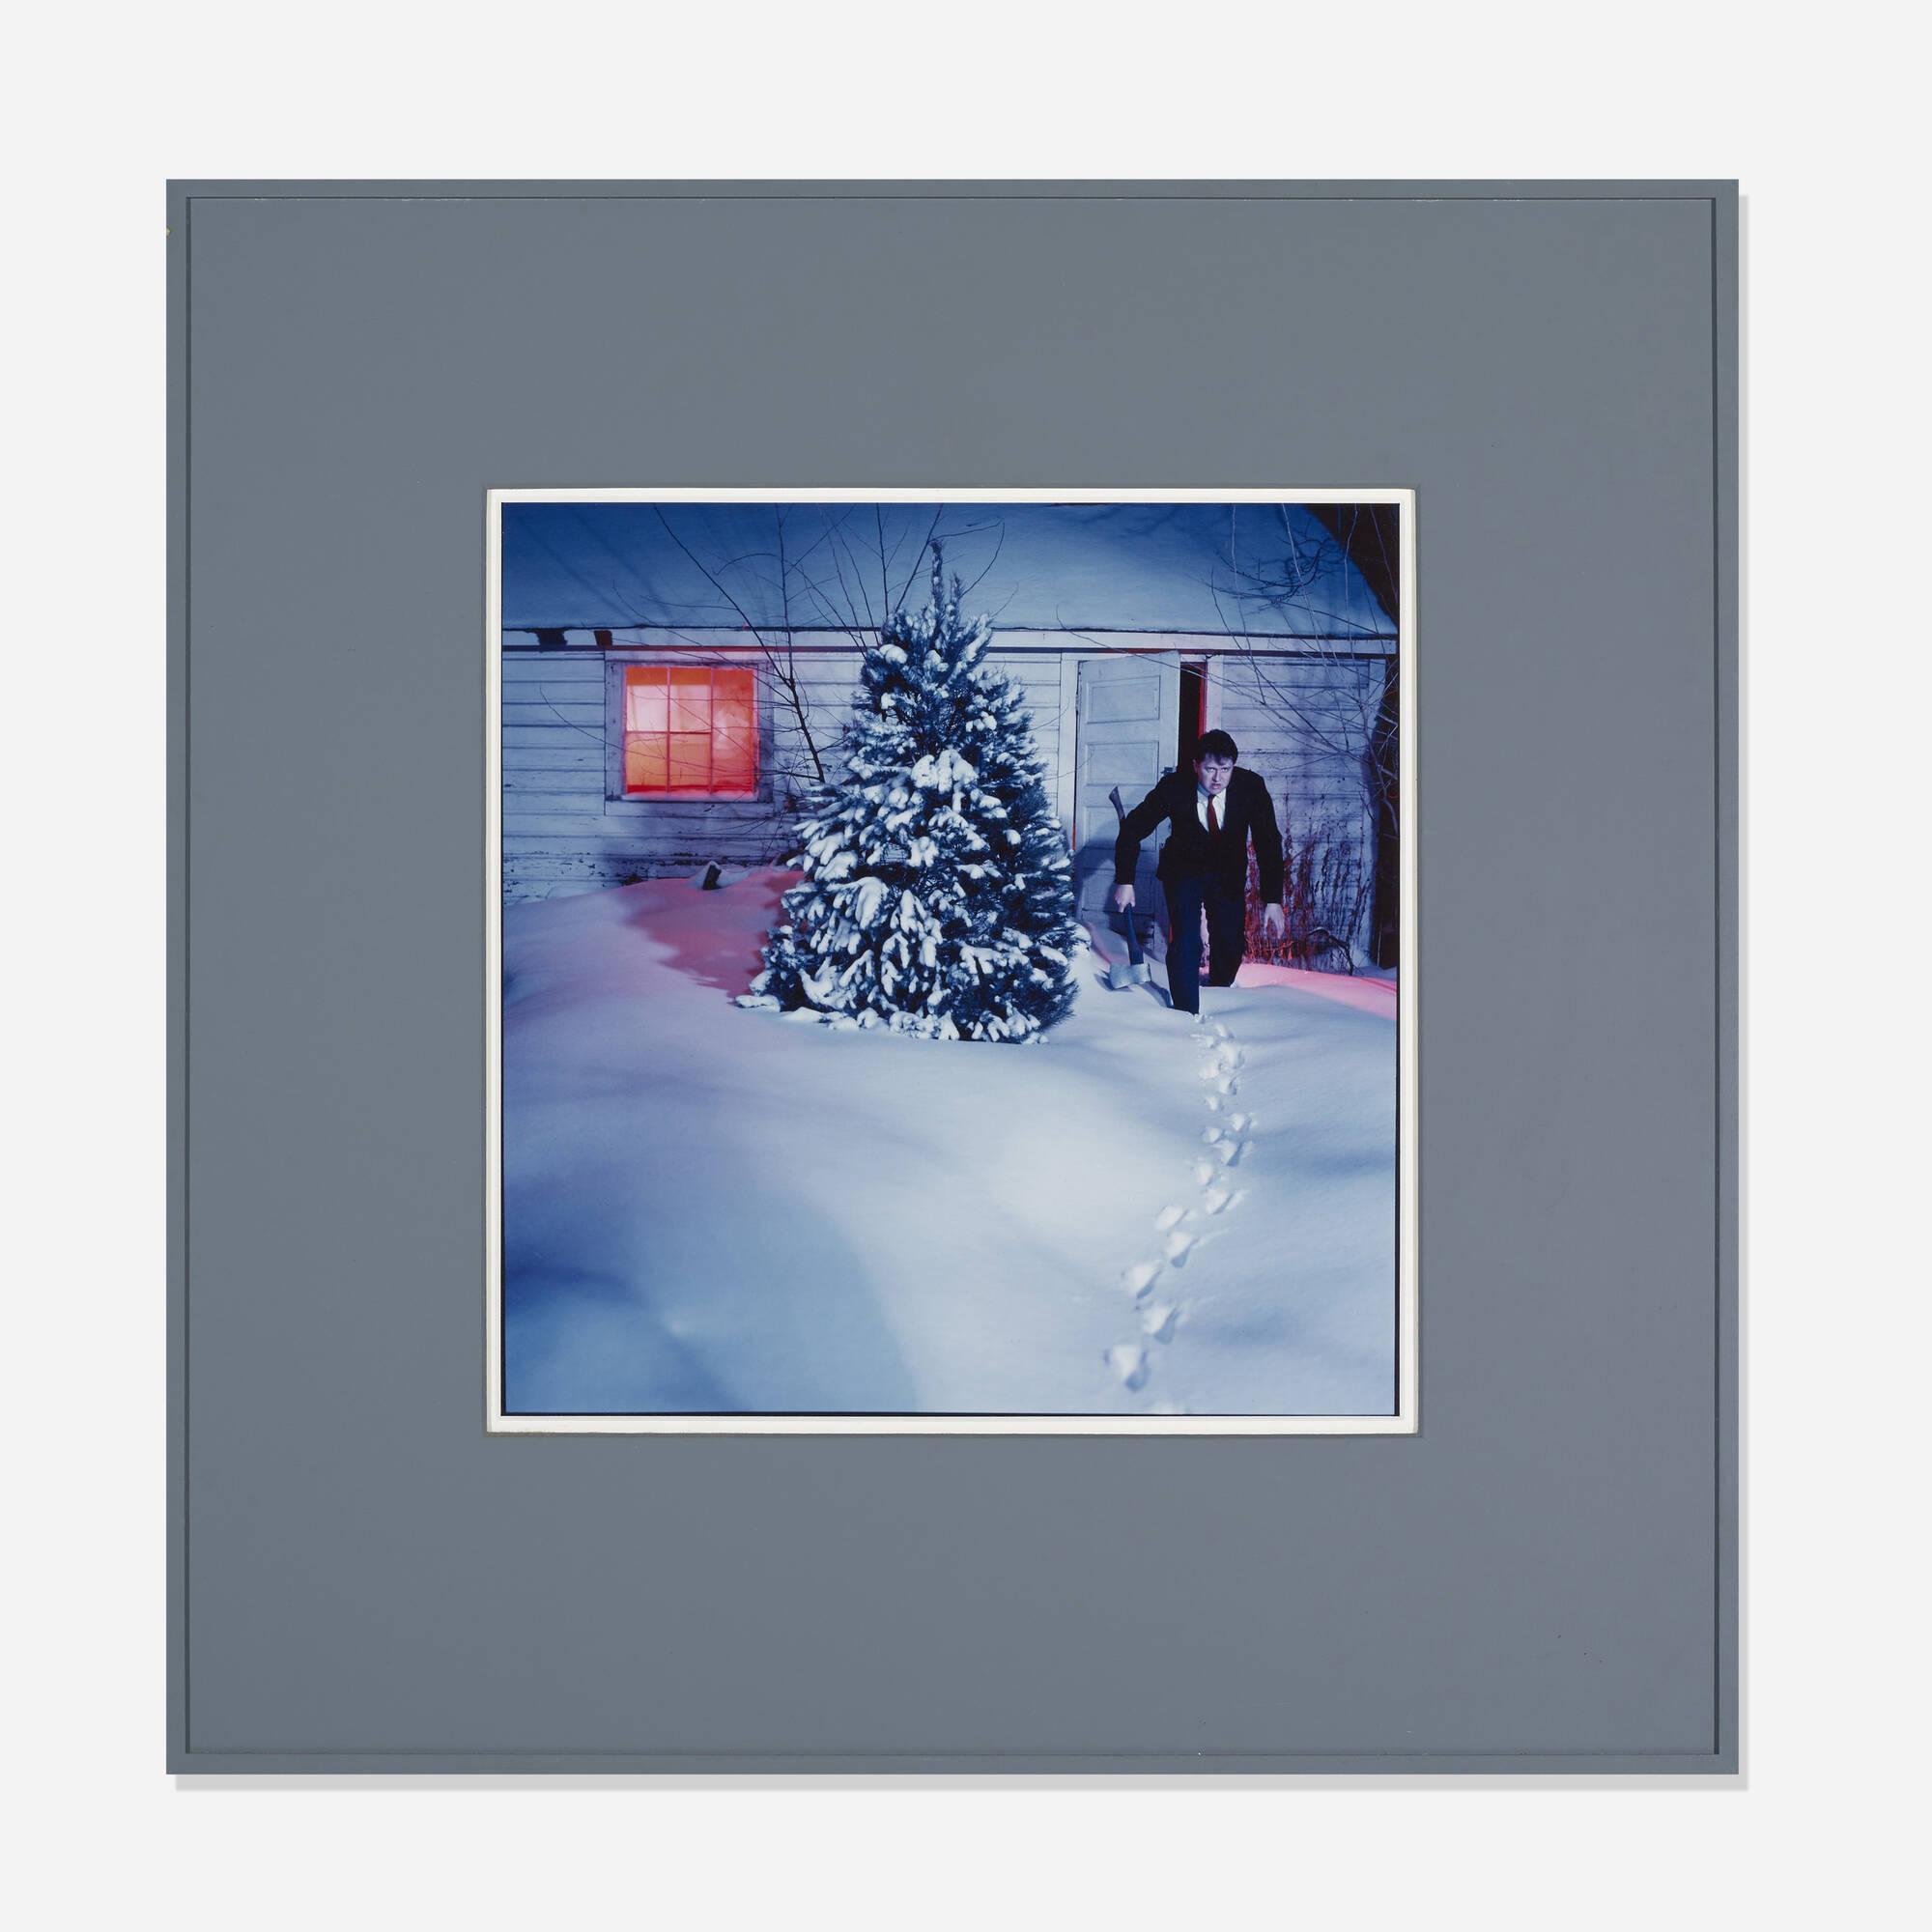 201: Bruce Charlesworth / Untitled (Snow-Bound Cabin) (1 of 1)